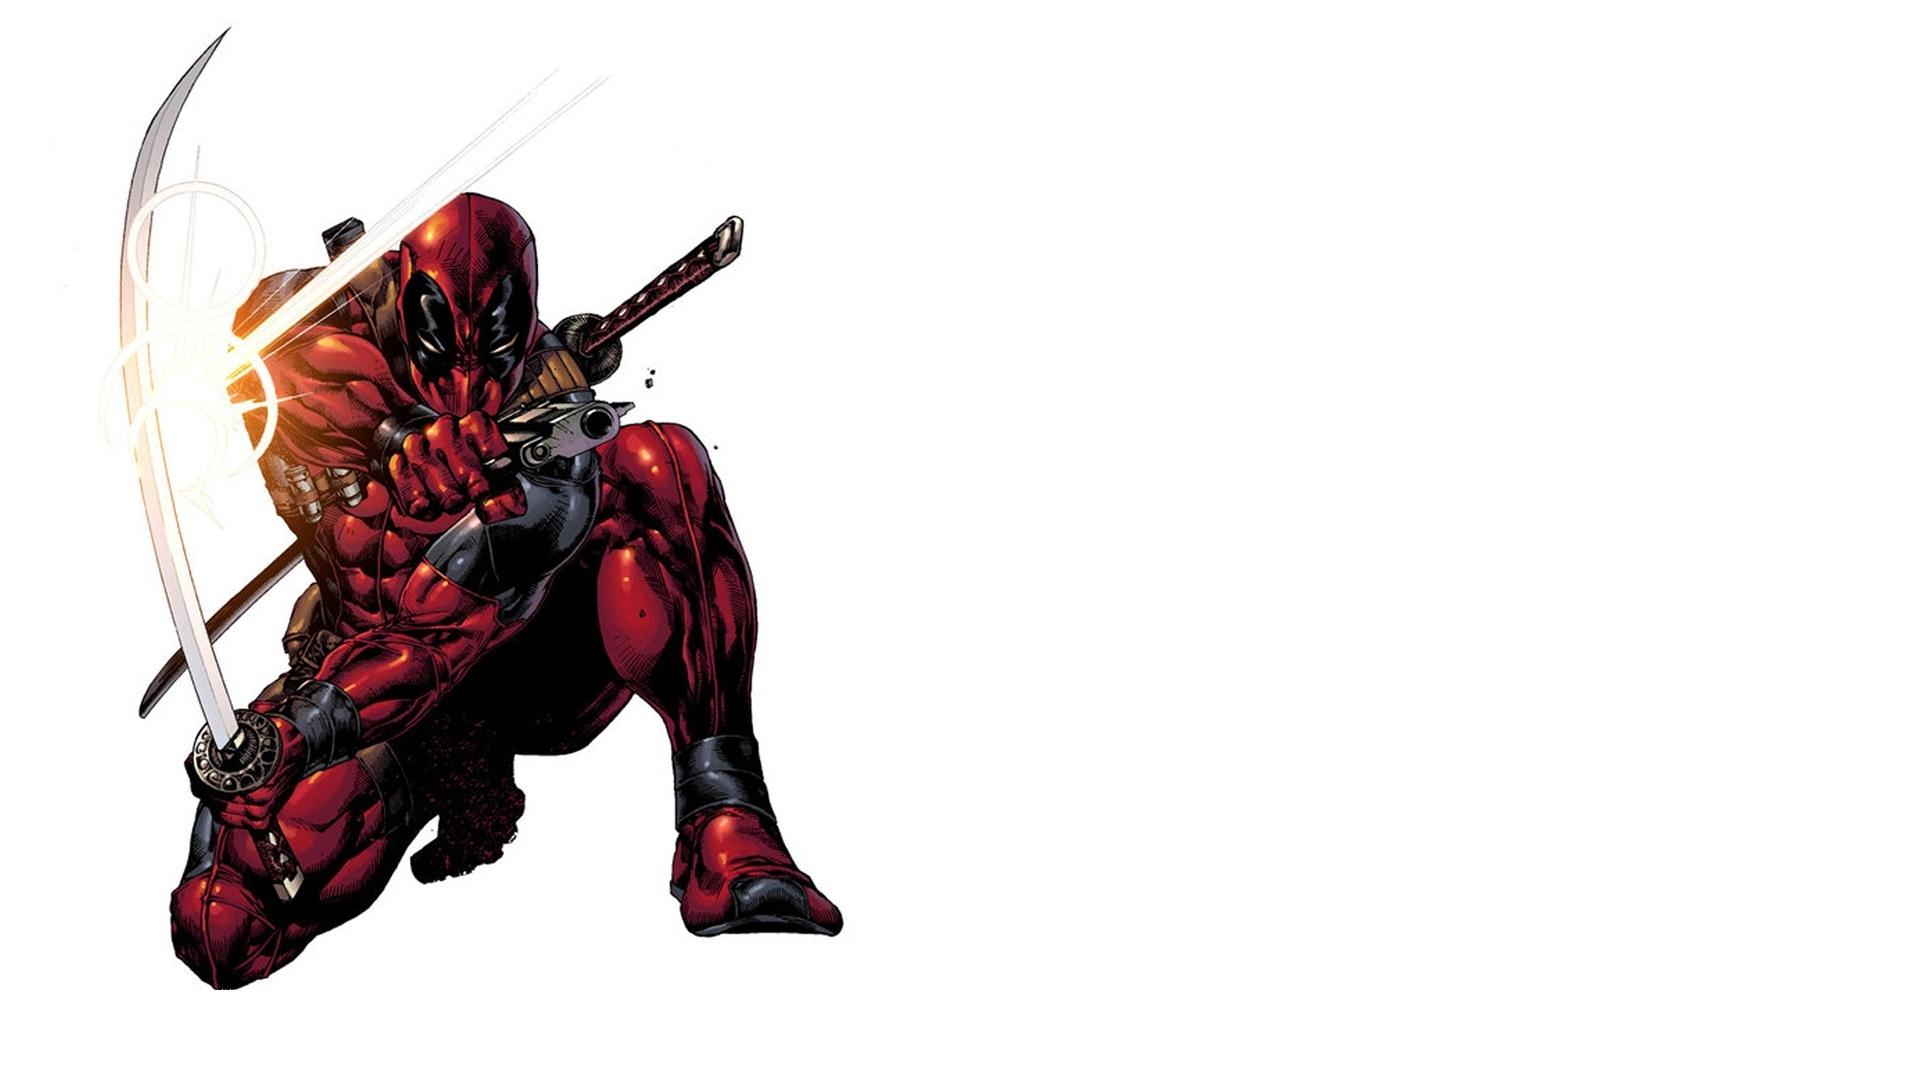 Deadpool Extreme Wallpaper